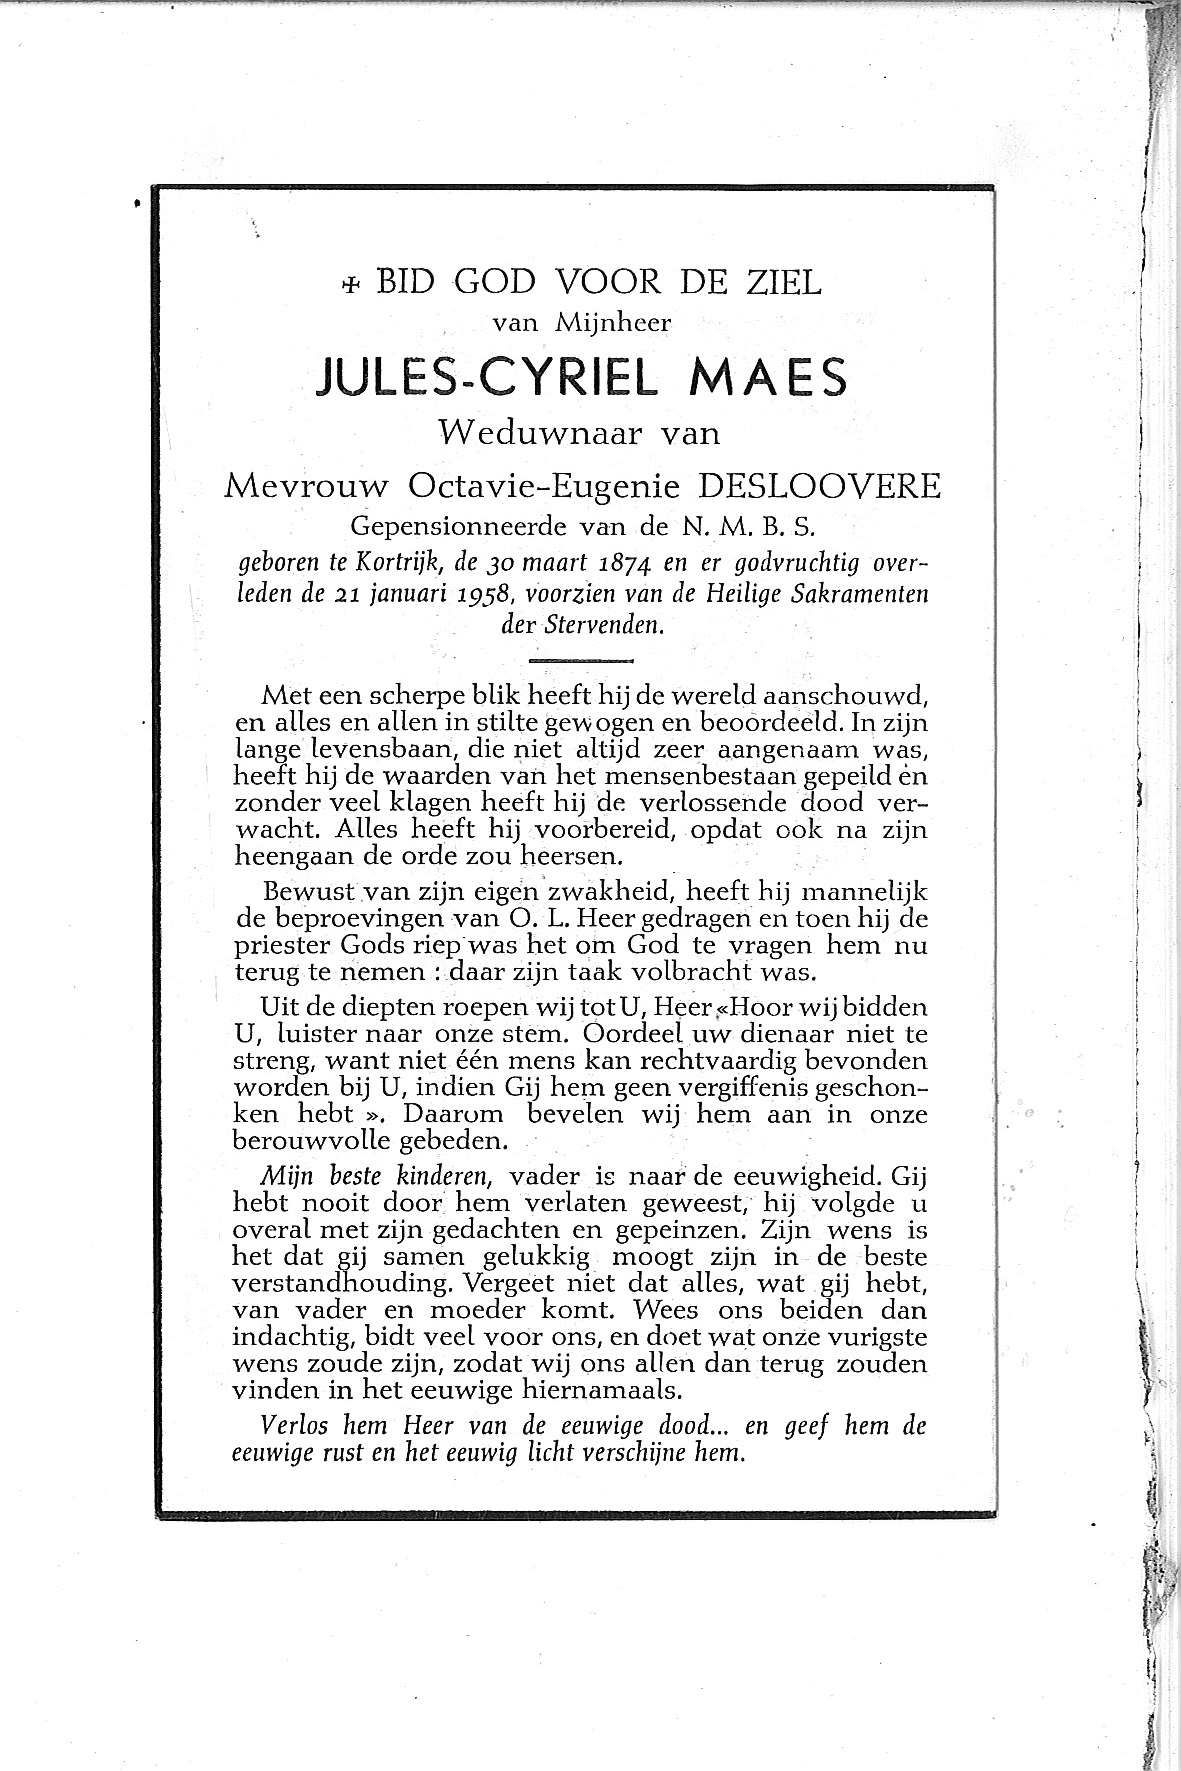 Jules-Cyriel(1958)20111109083150_00272.jpg